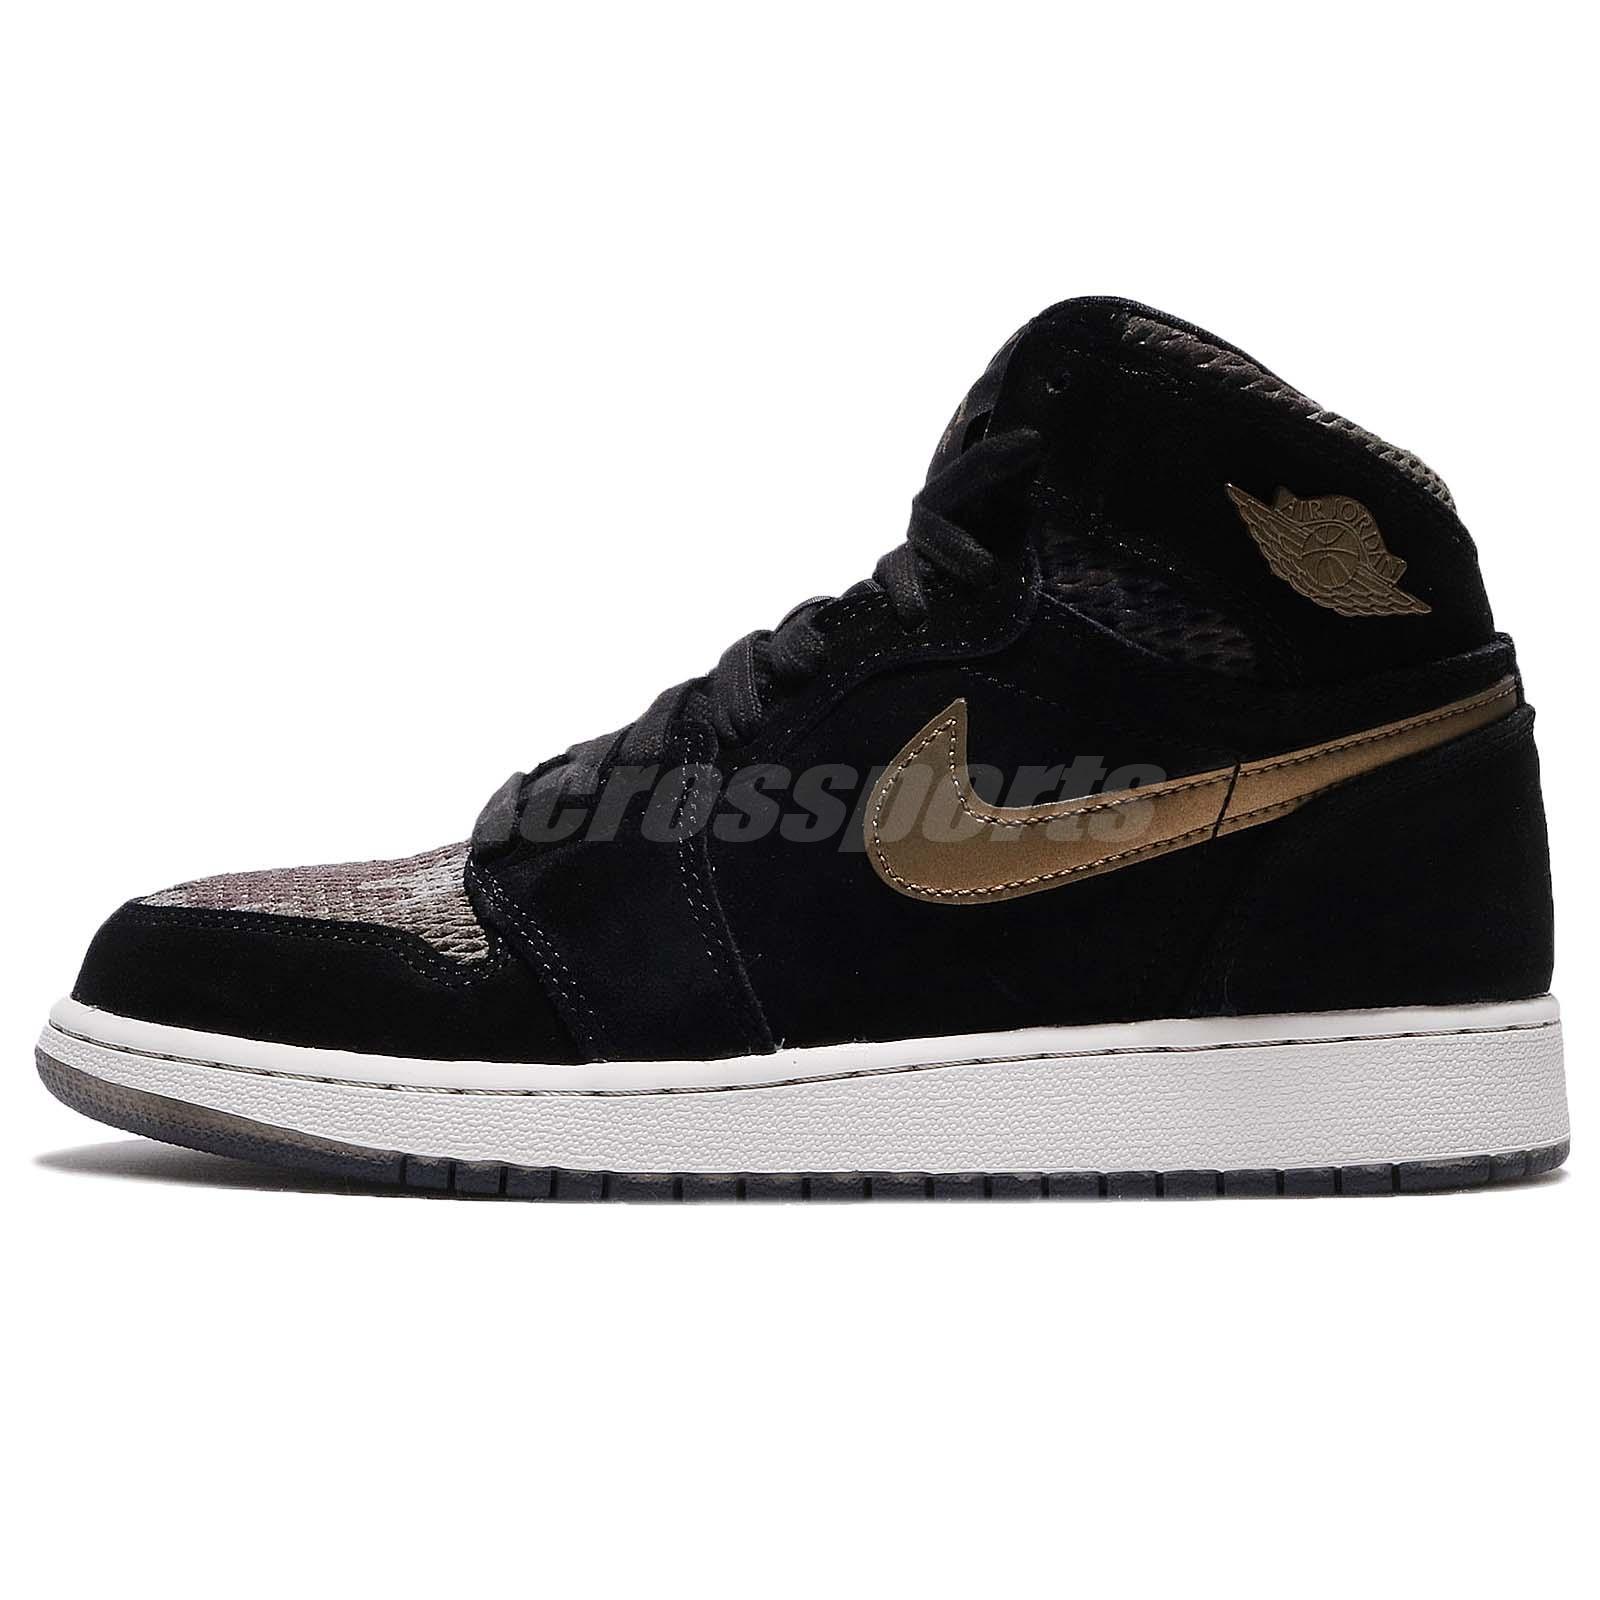 88c26139dd0 Nike Air Jordan 1 Retro Hi PREM HC GG Heiress Camo Black Kids Women  832596-030